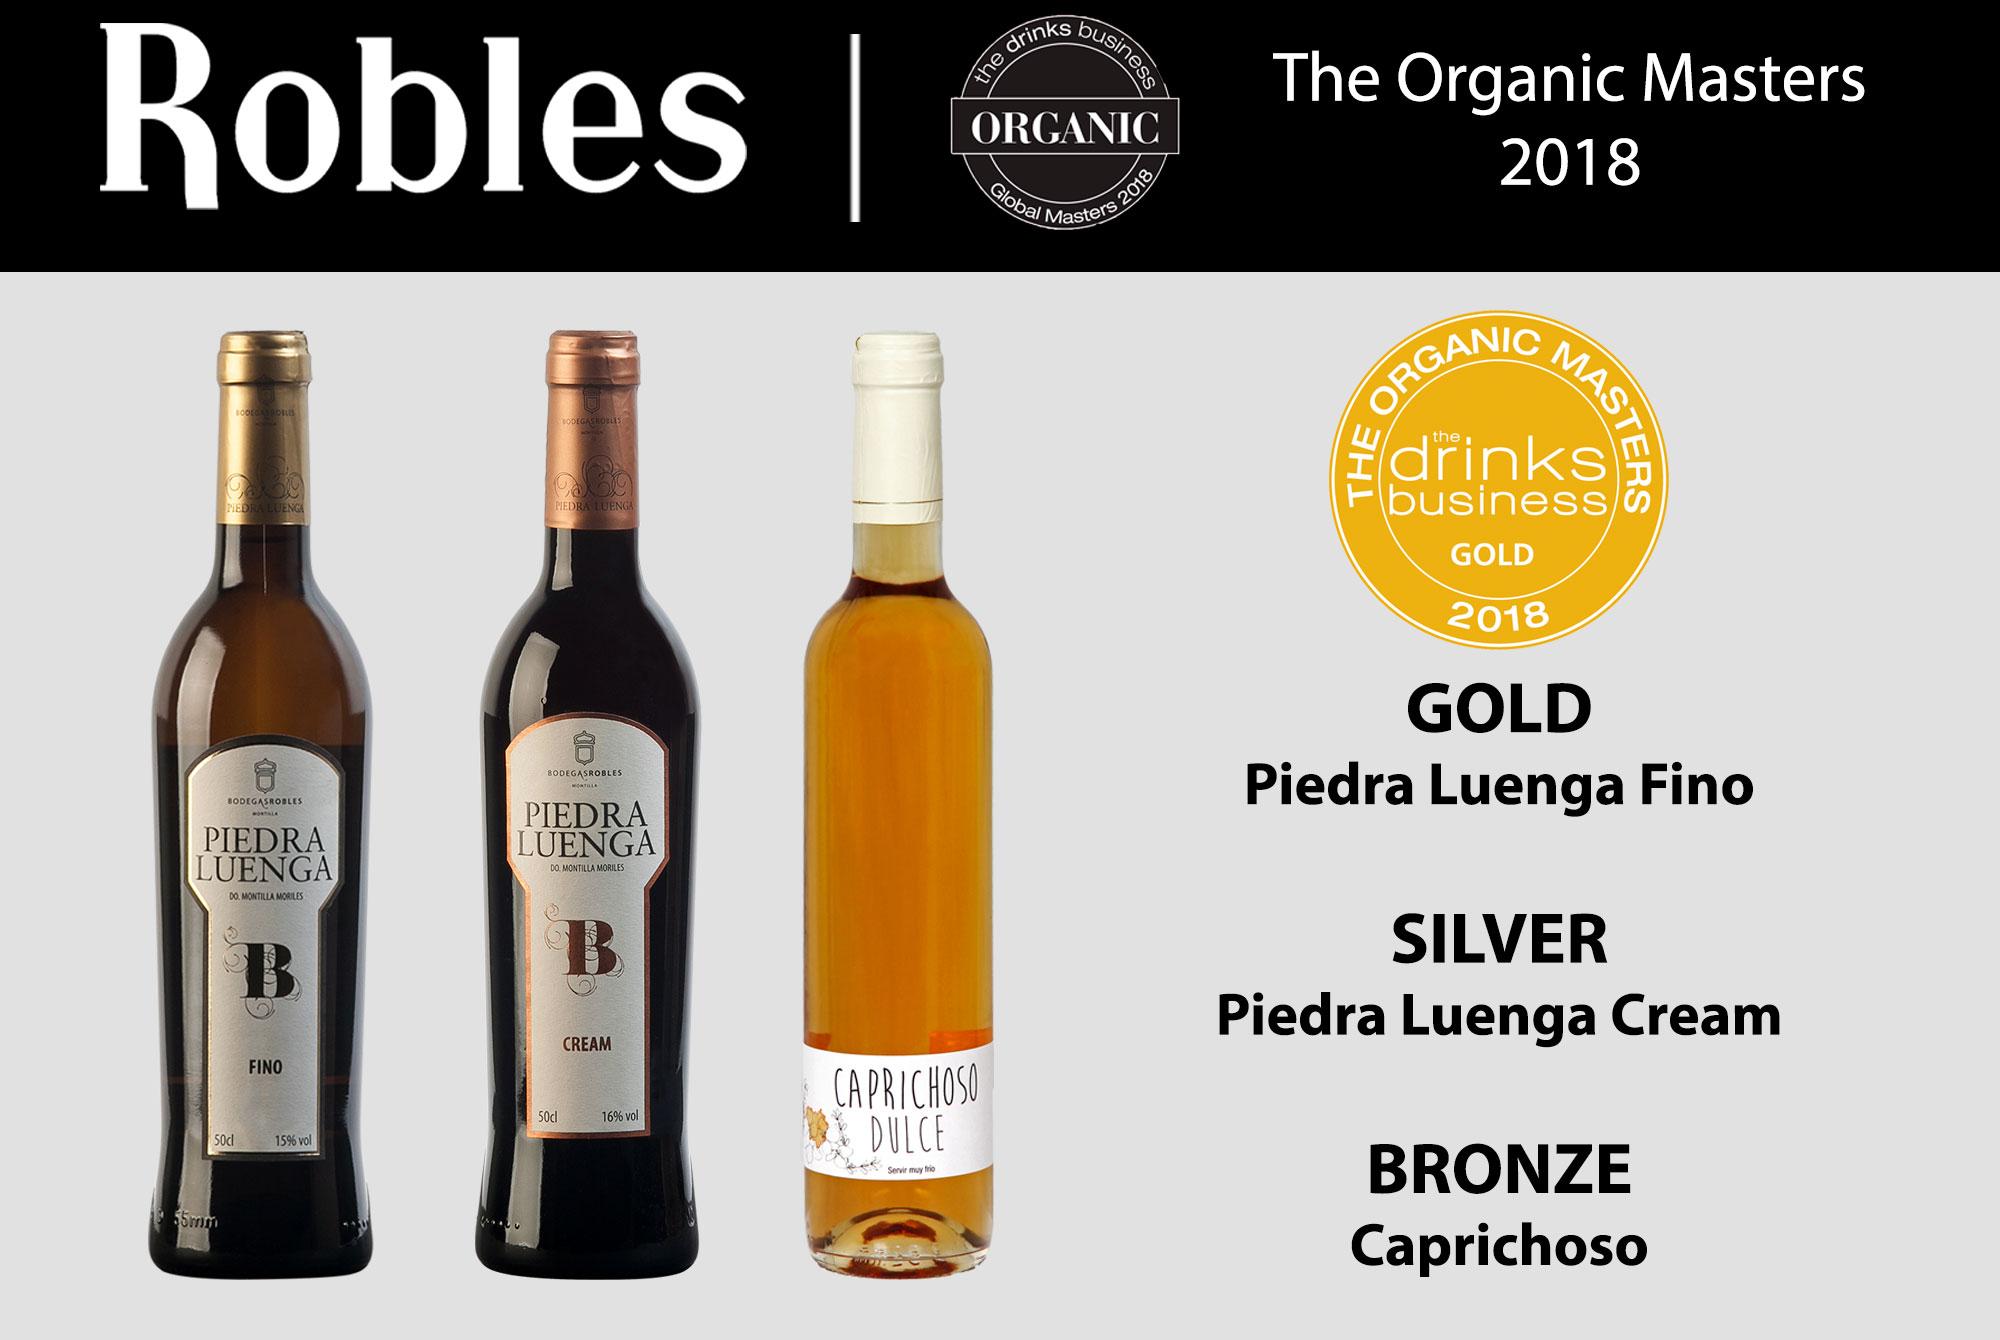 Masters of Wines reconocen los vinos de Bodegas Robles: The Global Organic Masters.